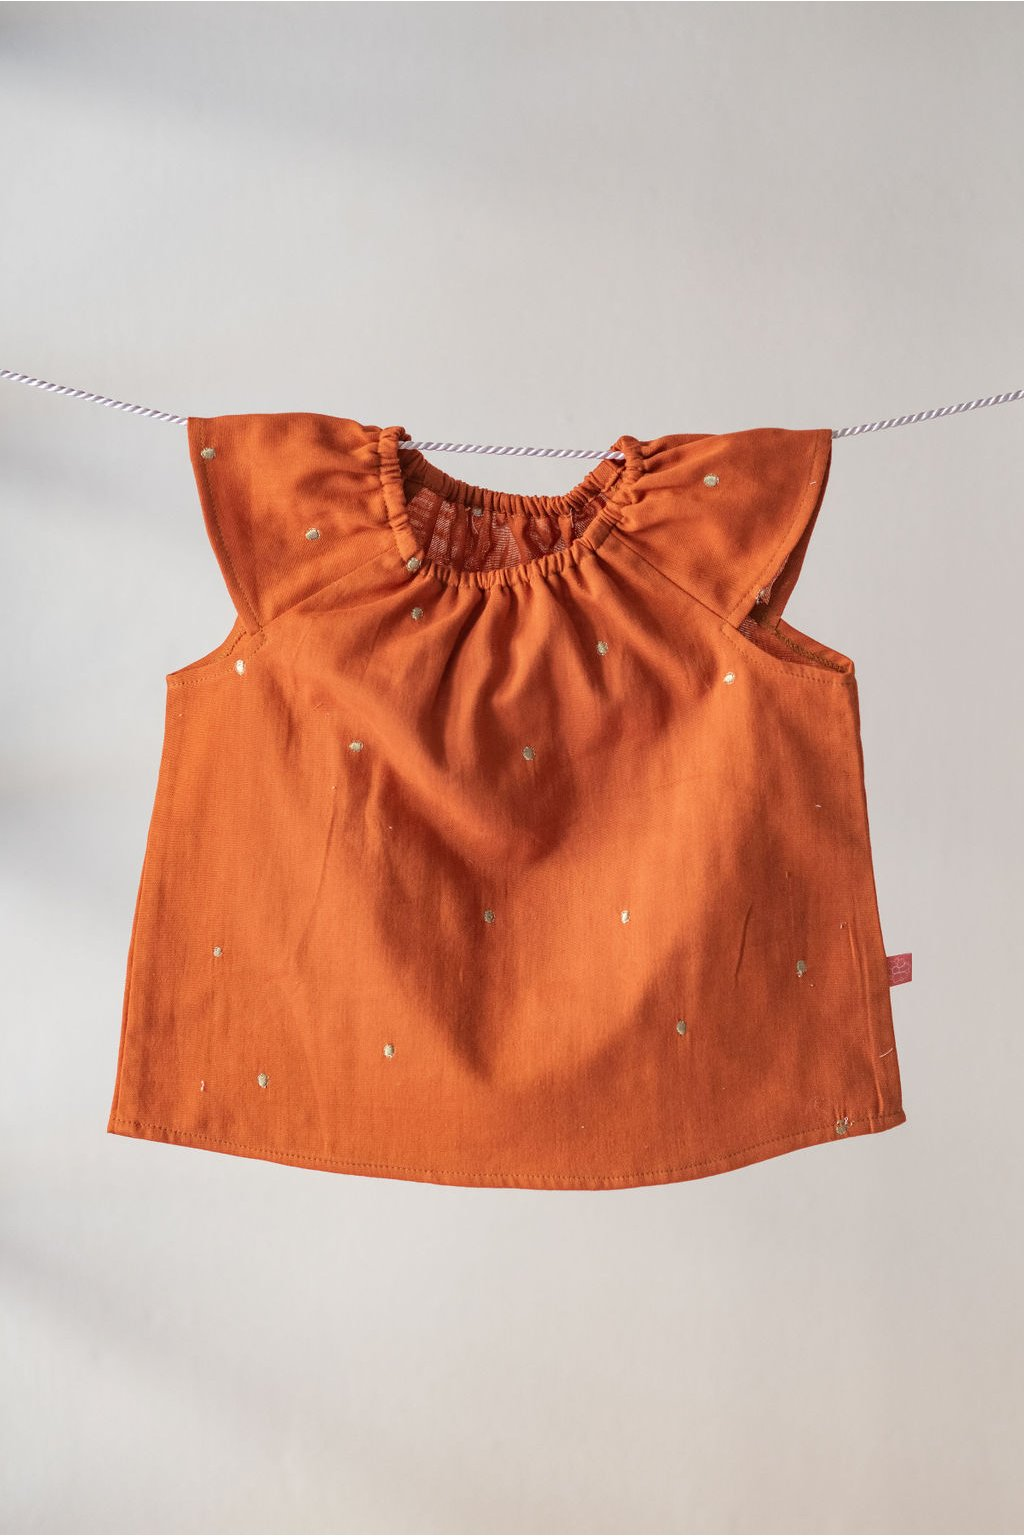 reparada detska halenka apolenka dvojita gazovina oranzova1